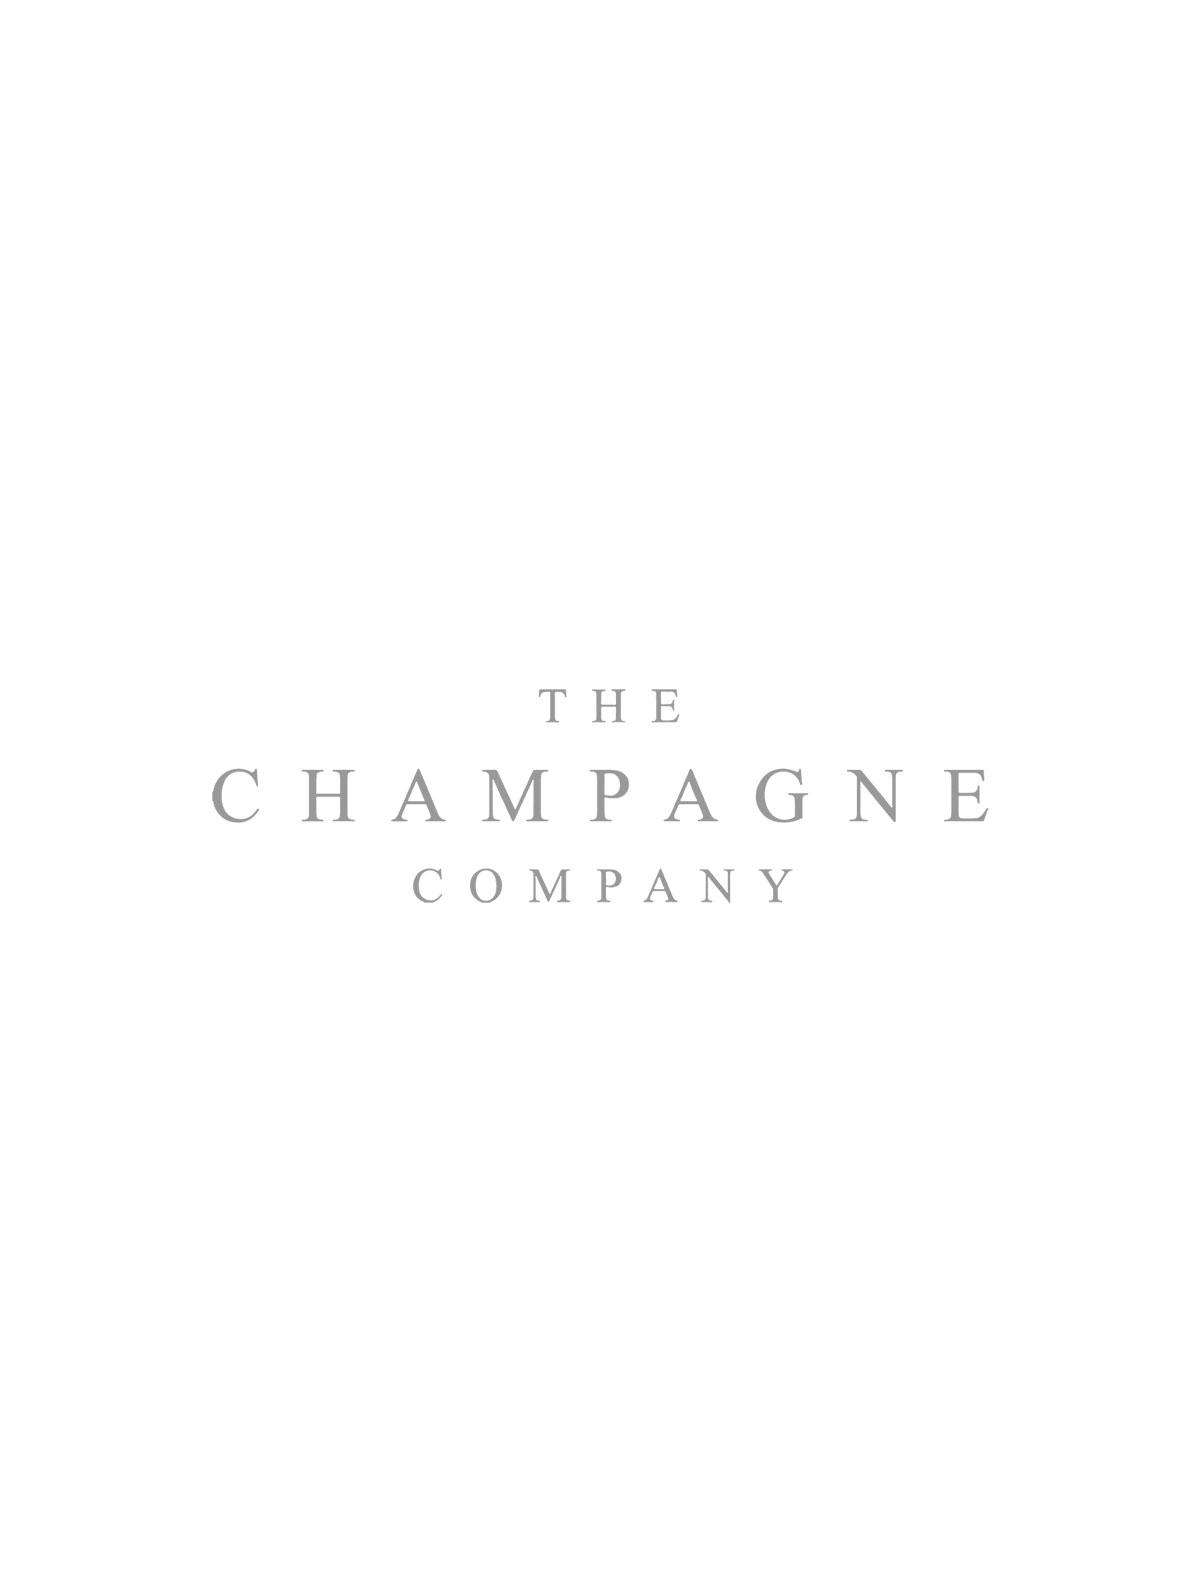 Dom Perignon 2010 Vintage Champagne 75cl Luxury Gift Box